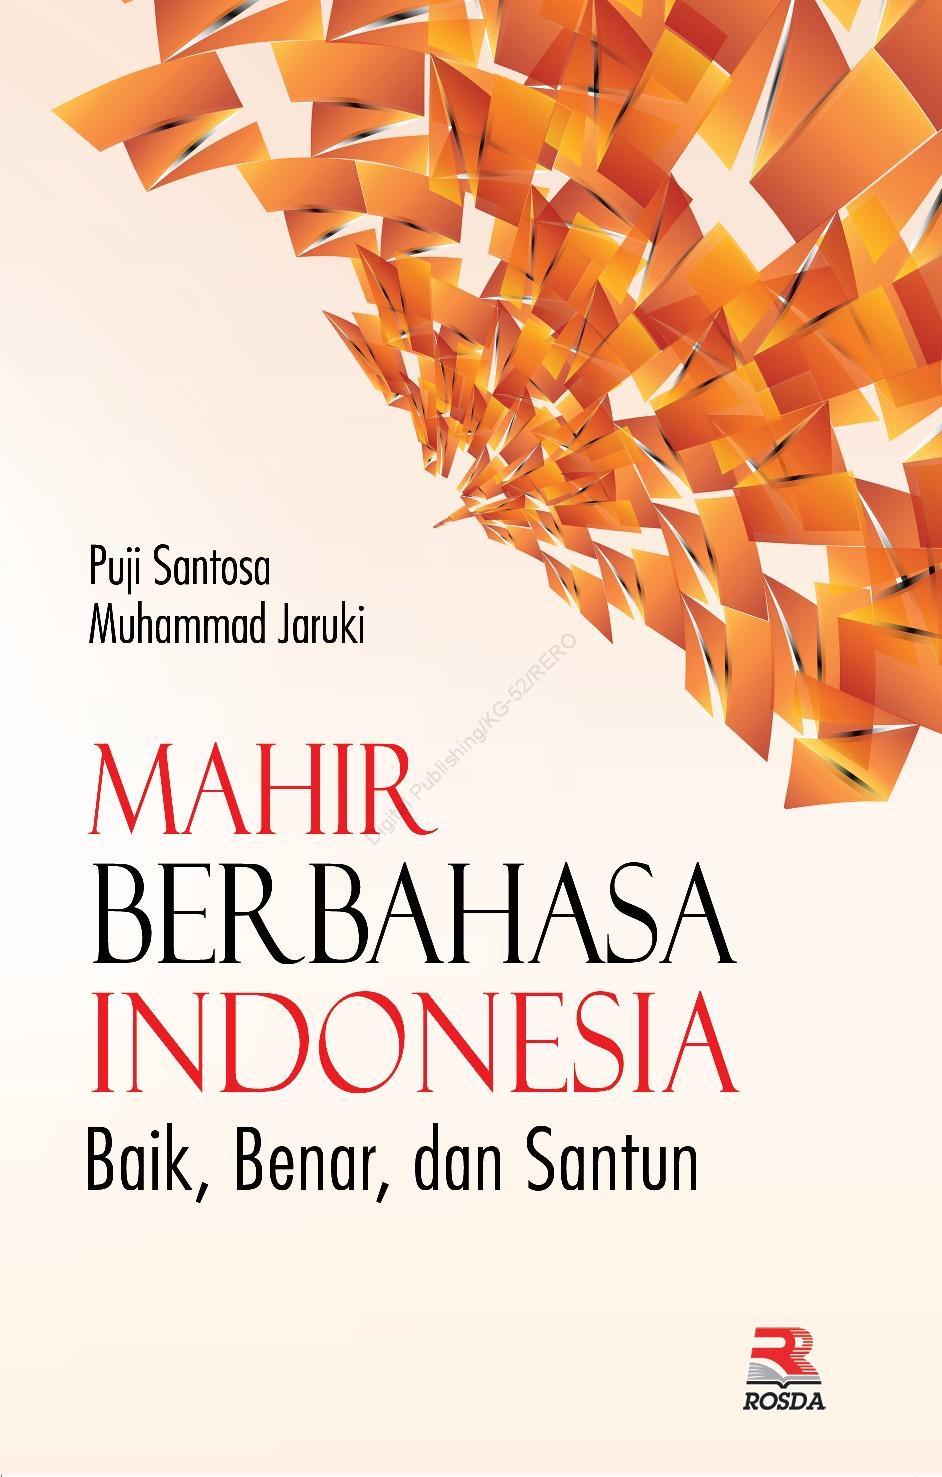 MAHIR BERBAHASA INDONESIA